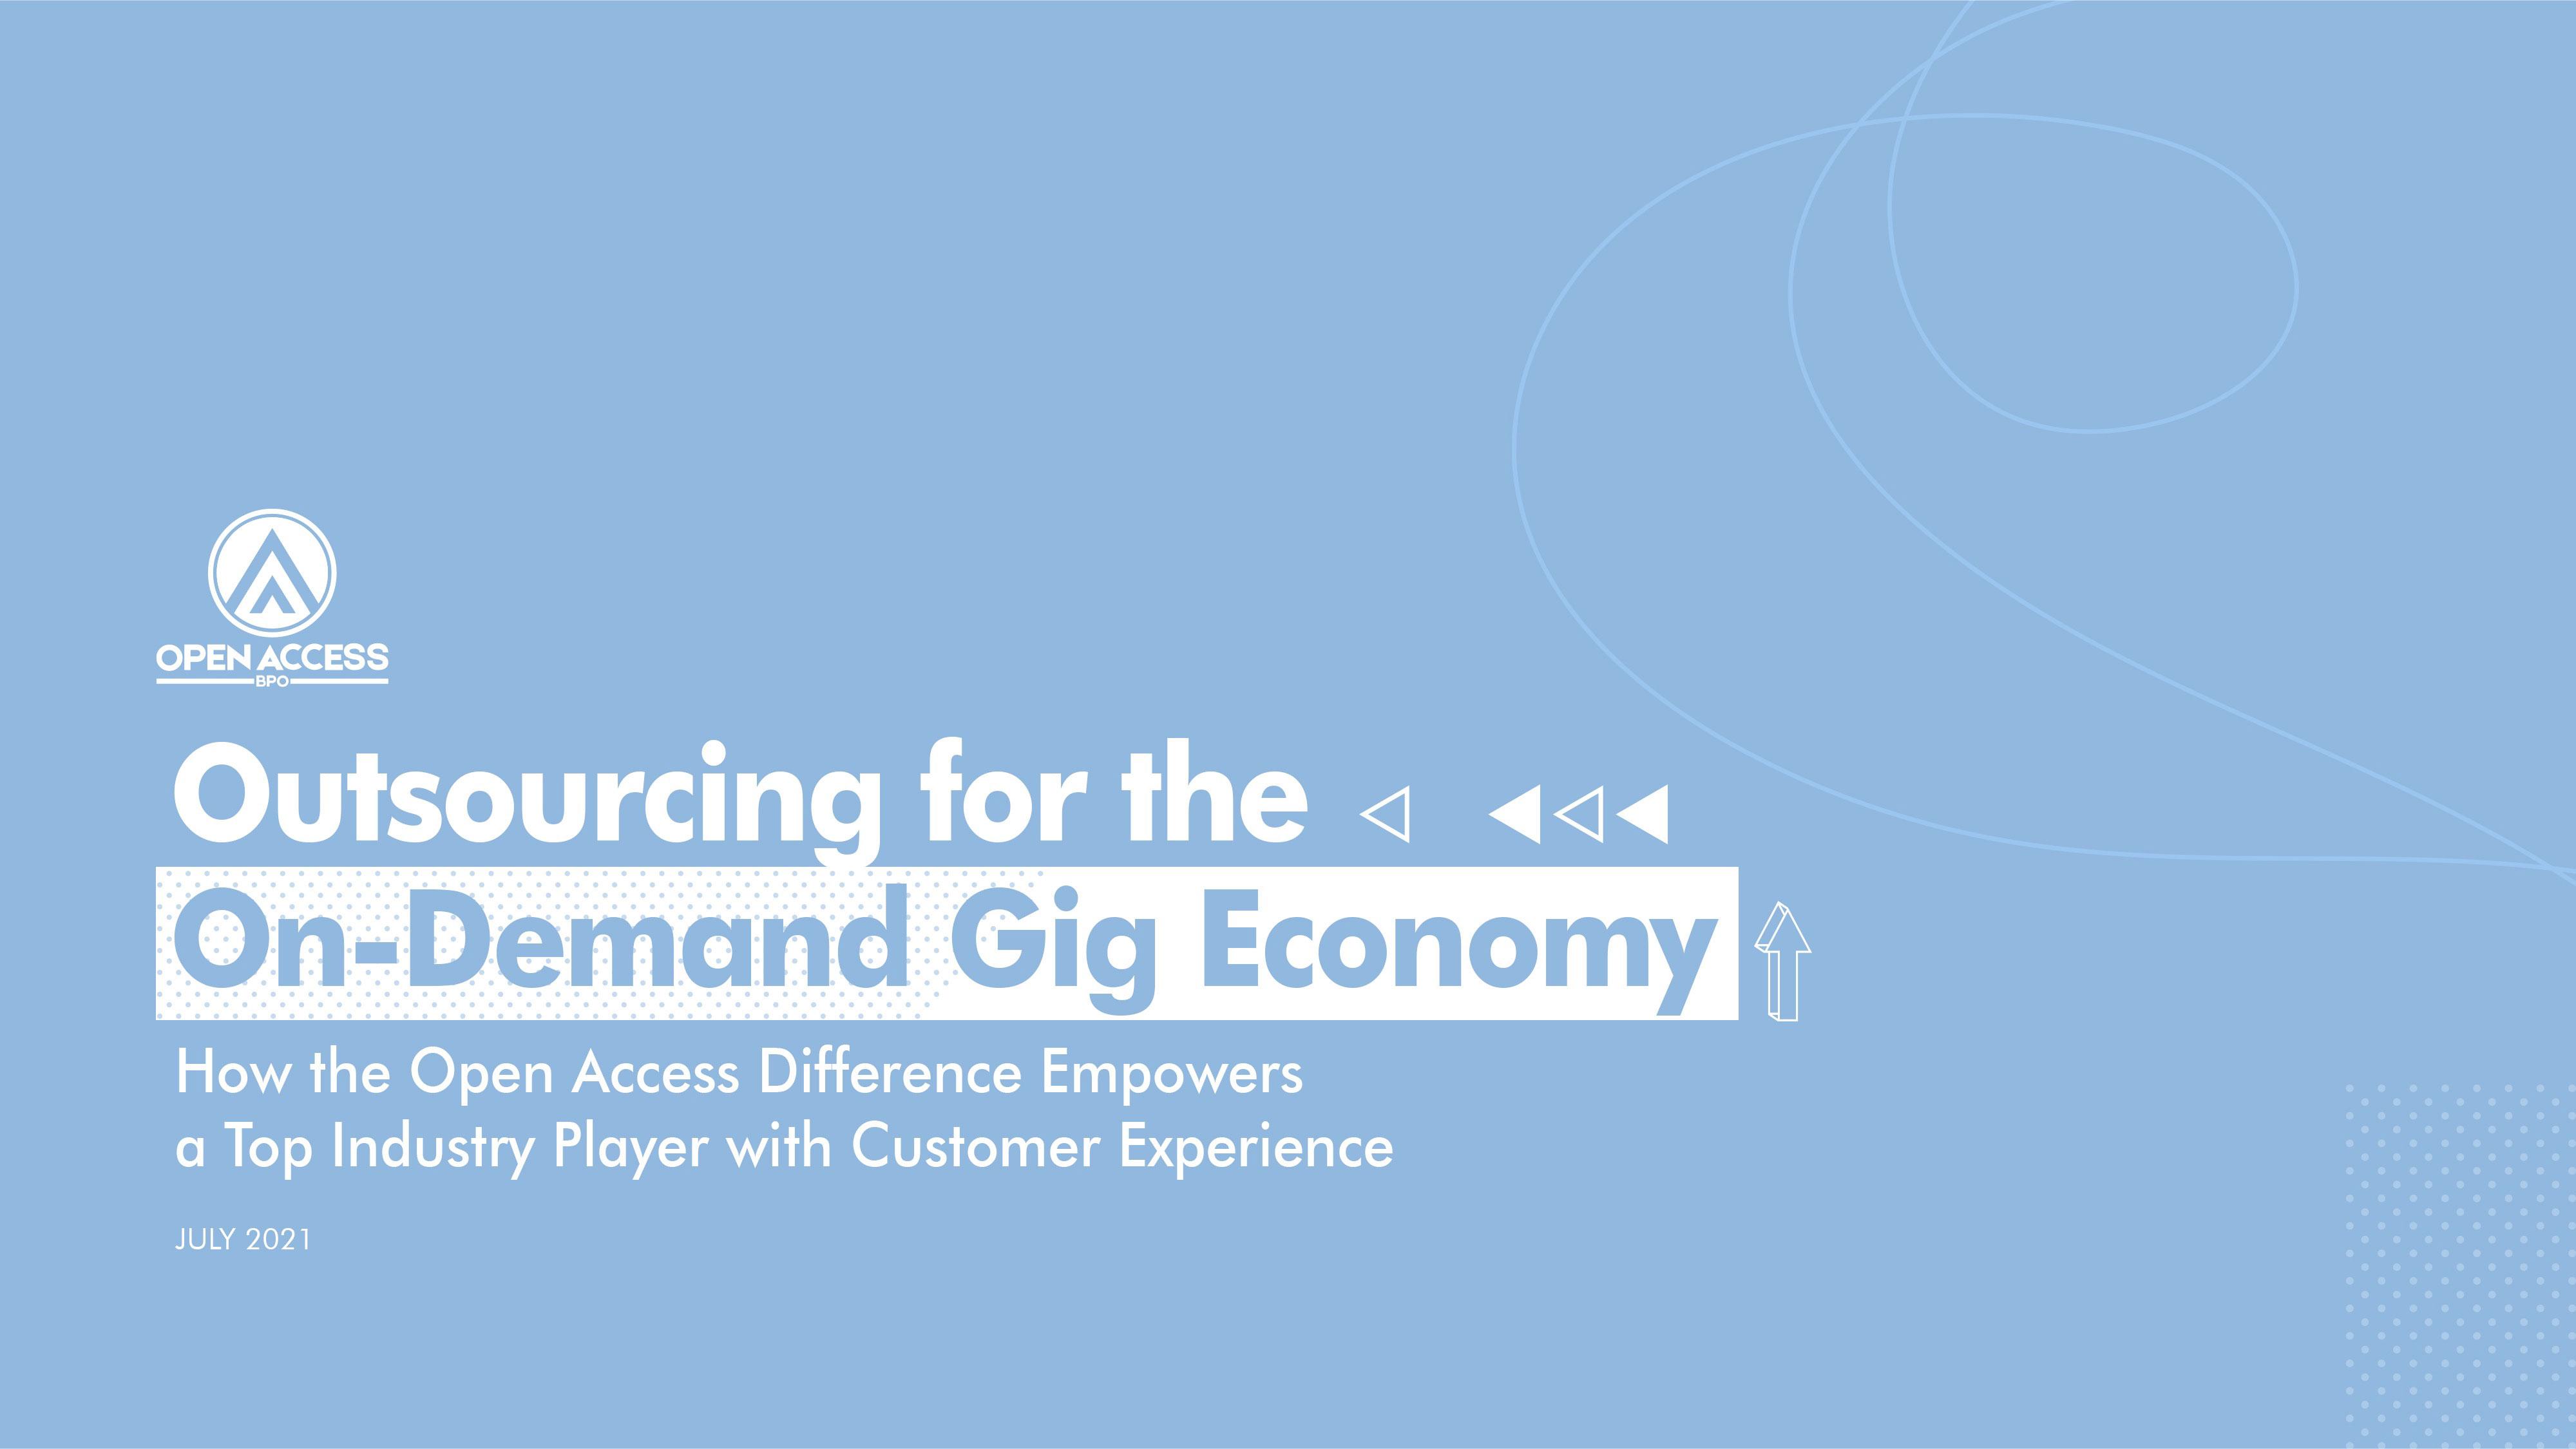 Open Access BPO Gig Economy outsourcing case study